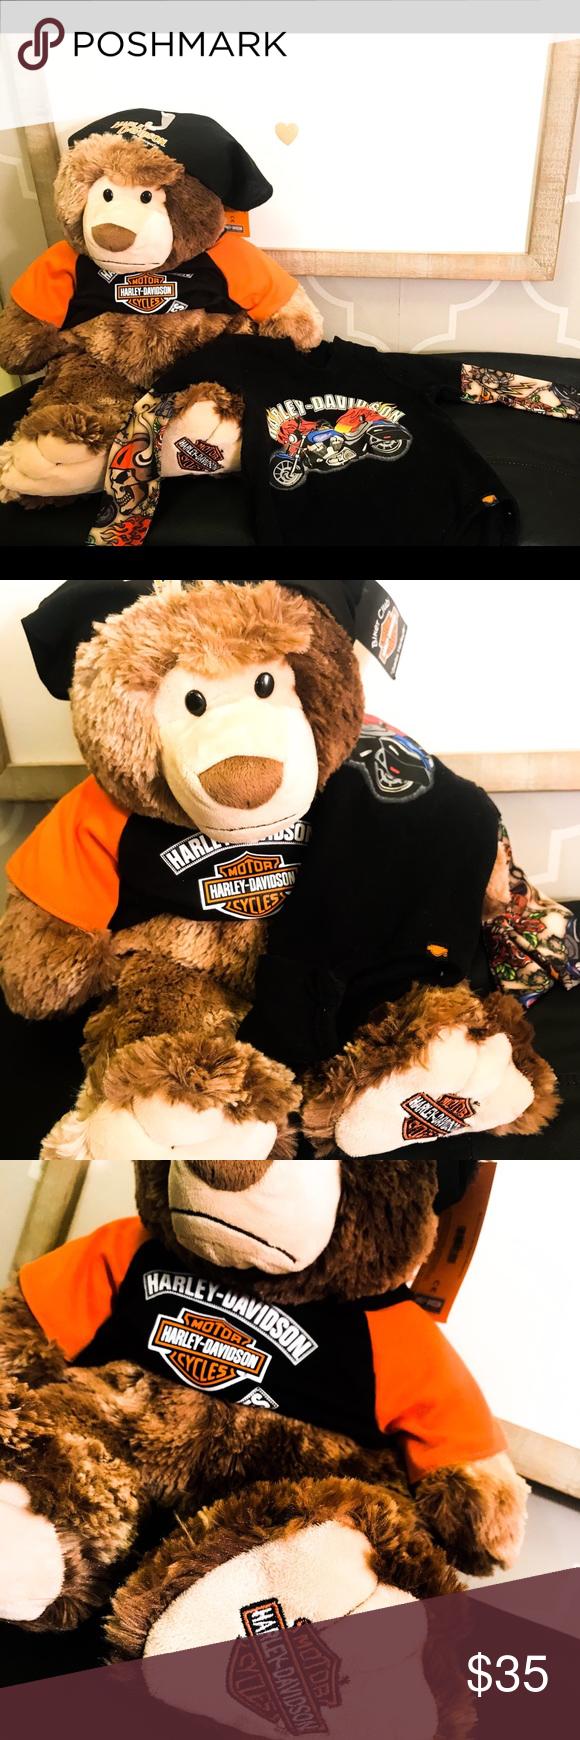 Harley Davidson Bear and onsie baby set!! NWT Harley